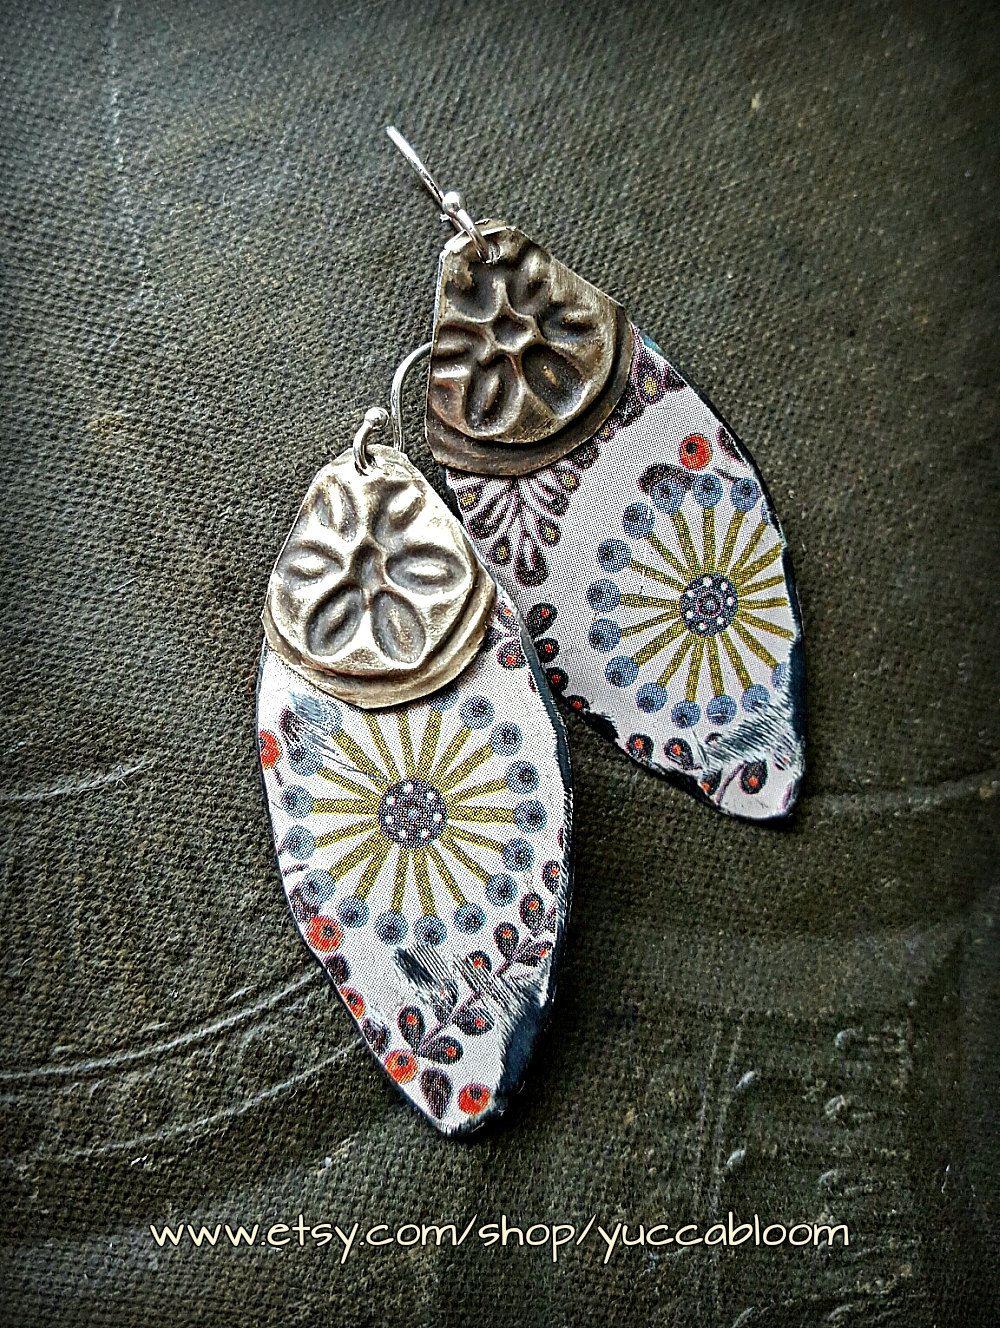 Tin Earrings, Traveler, Gypsy, Bohemian, Kuchi Banjara, Rustic ...